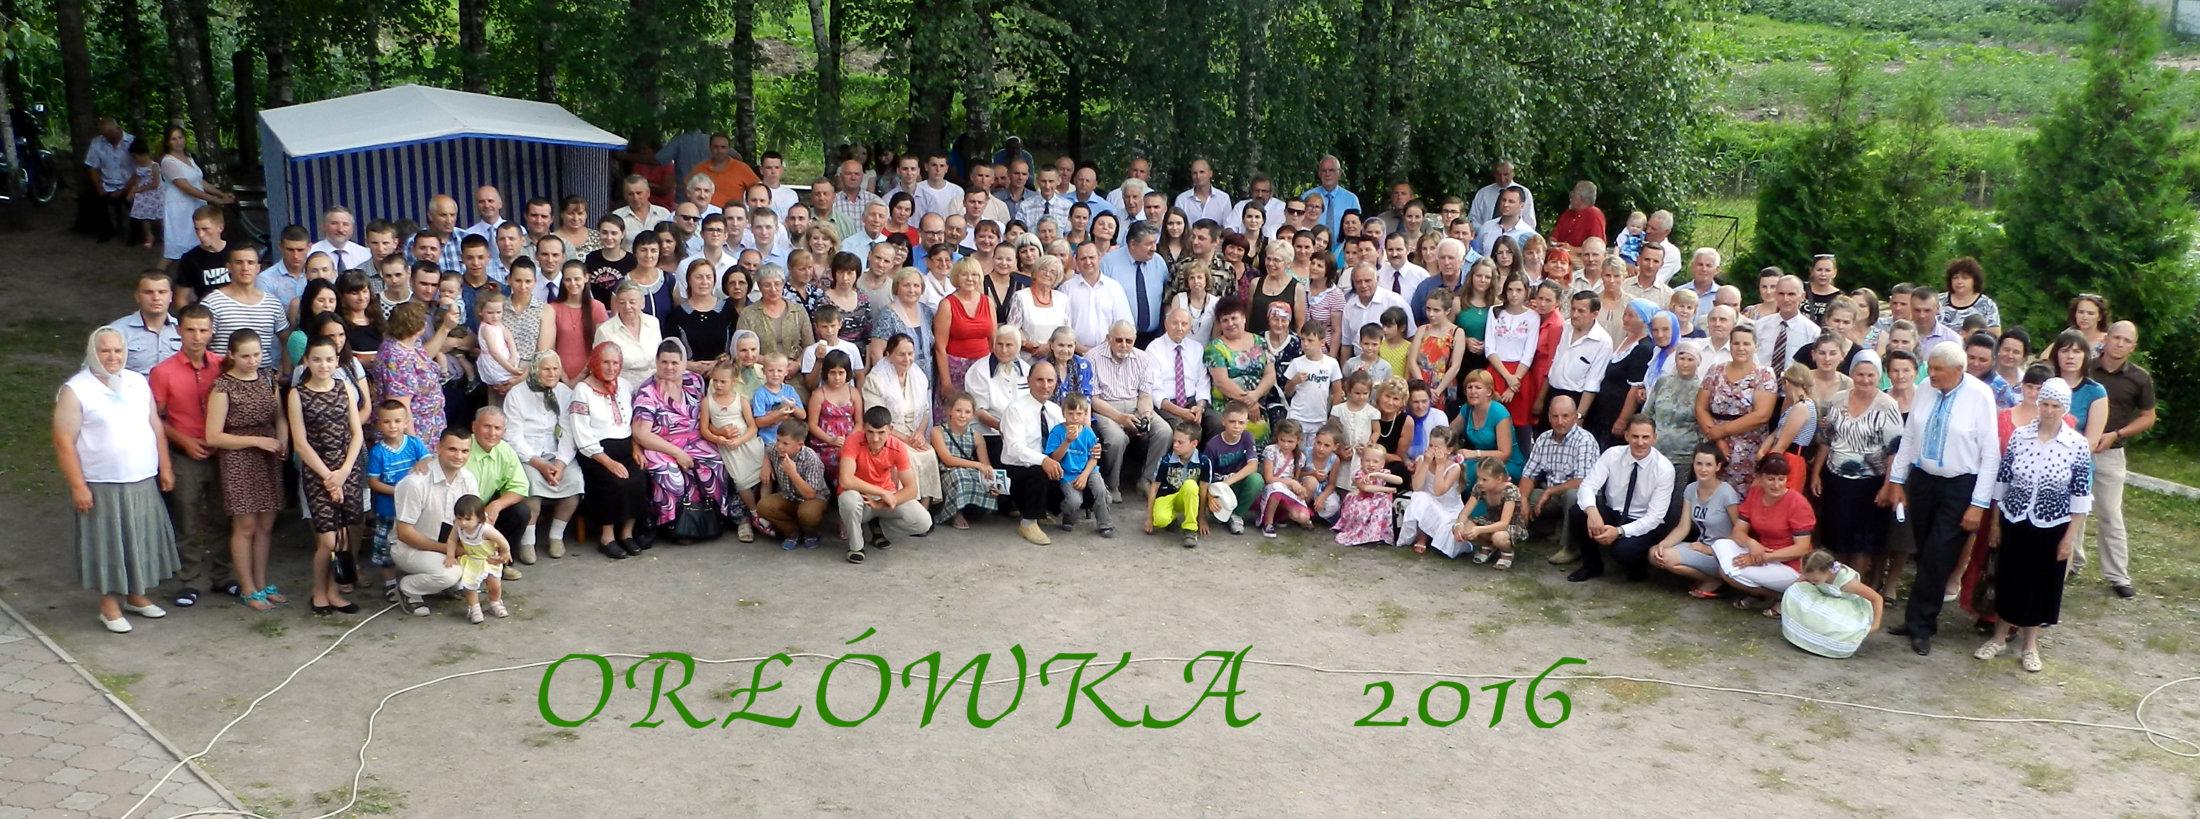 Orlowka_2016